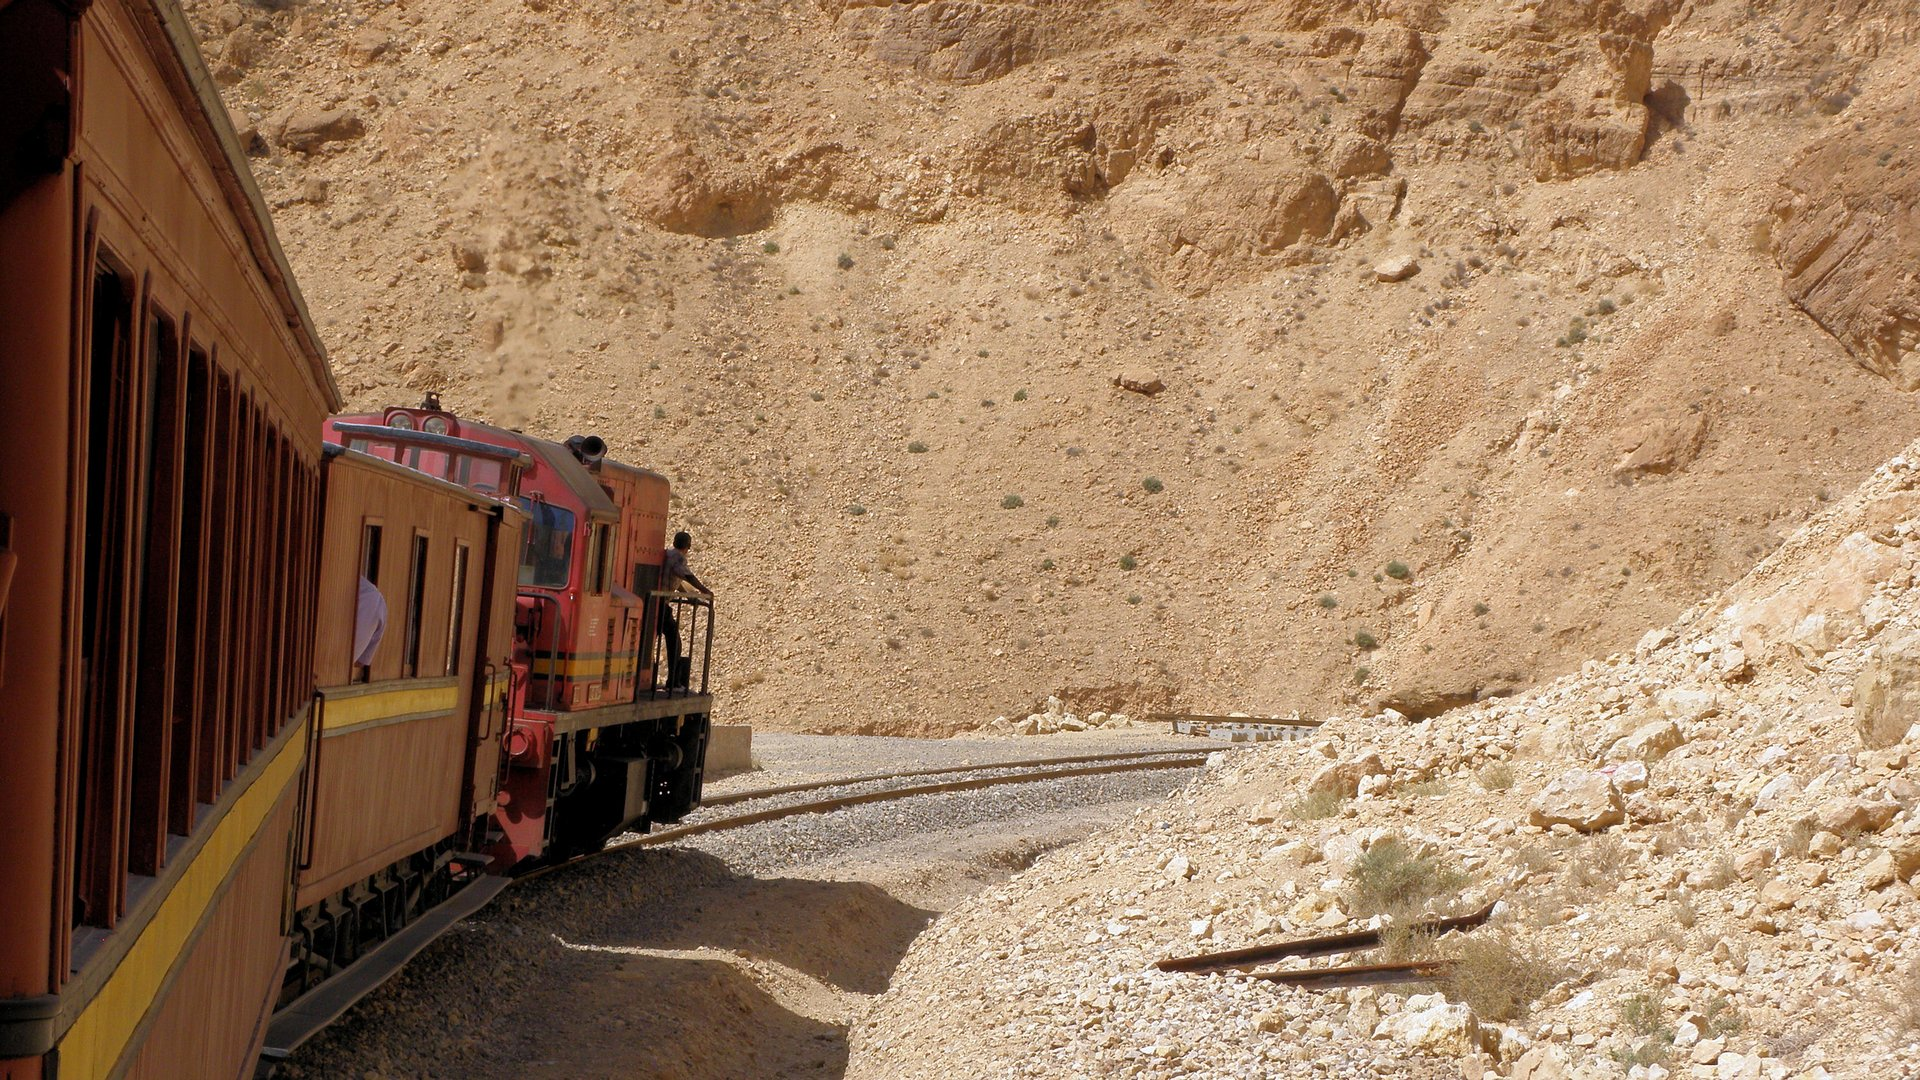 Le Train Lézard Rouge in Tunisia 2019 - Best Time